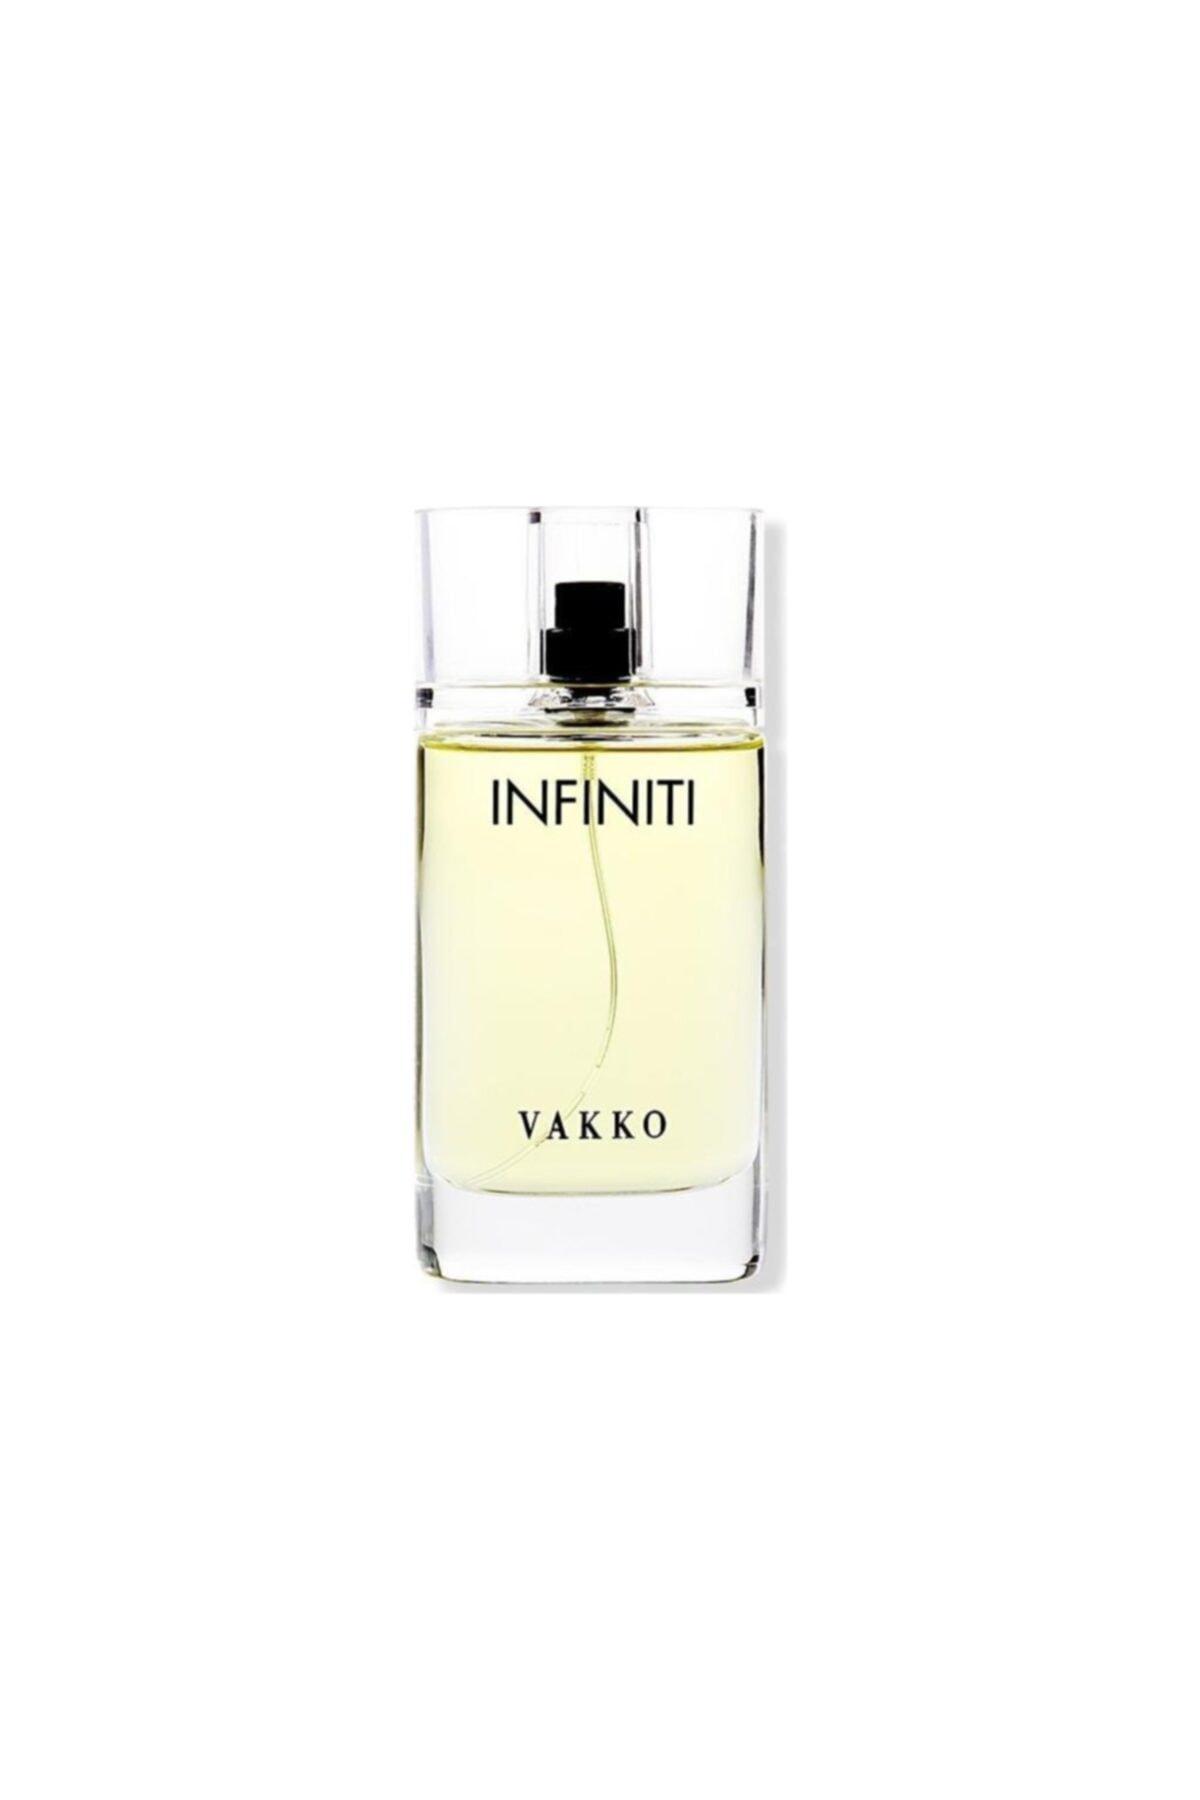 Vakko Infiniti Edp 100 ml Erkek Parfüm 8680720413780 2